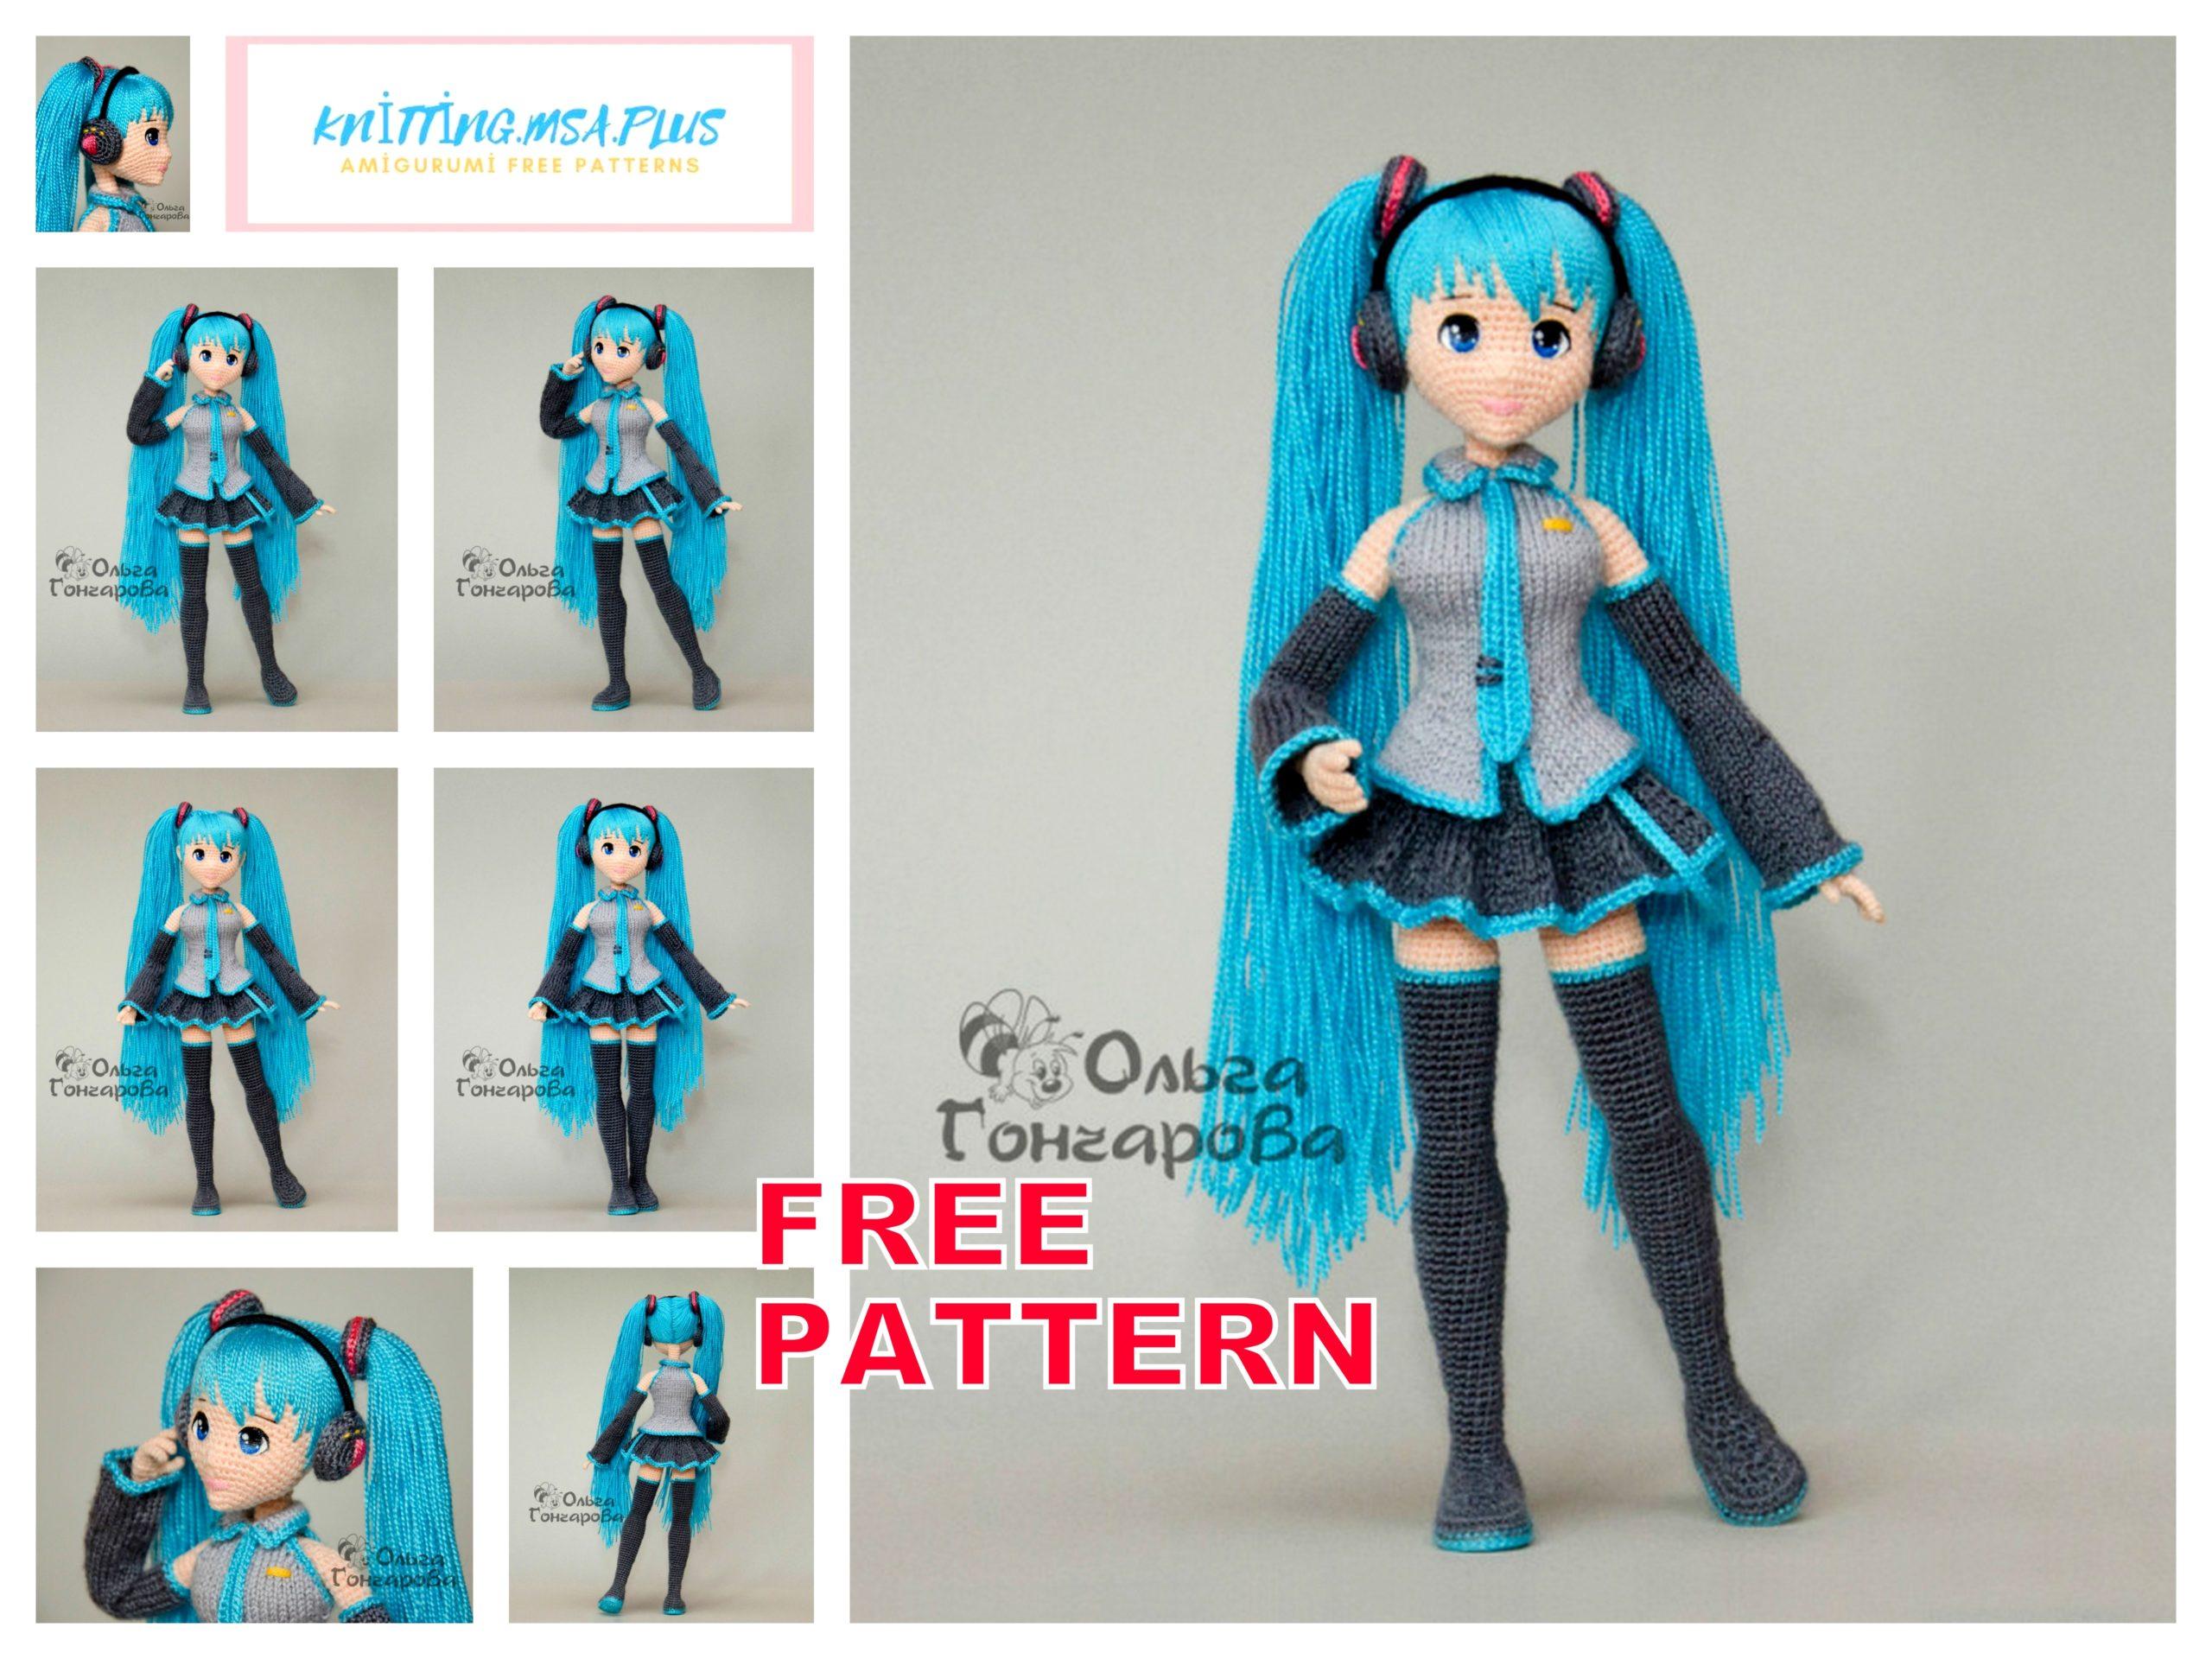 12+ Free Crochet Doll Clothes Patterns | FaveCrafts.com | 1920x2560